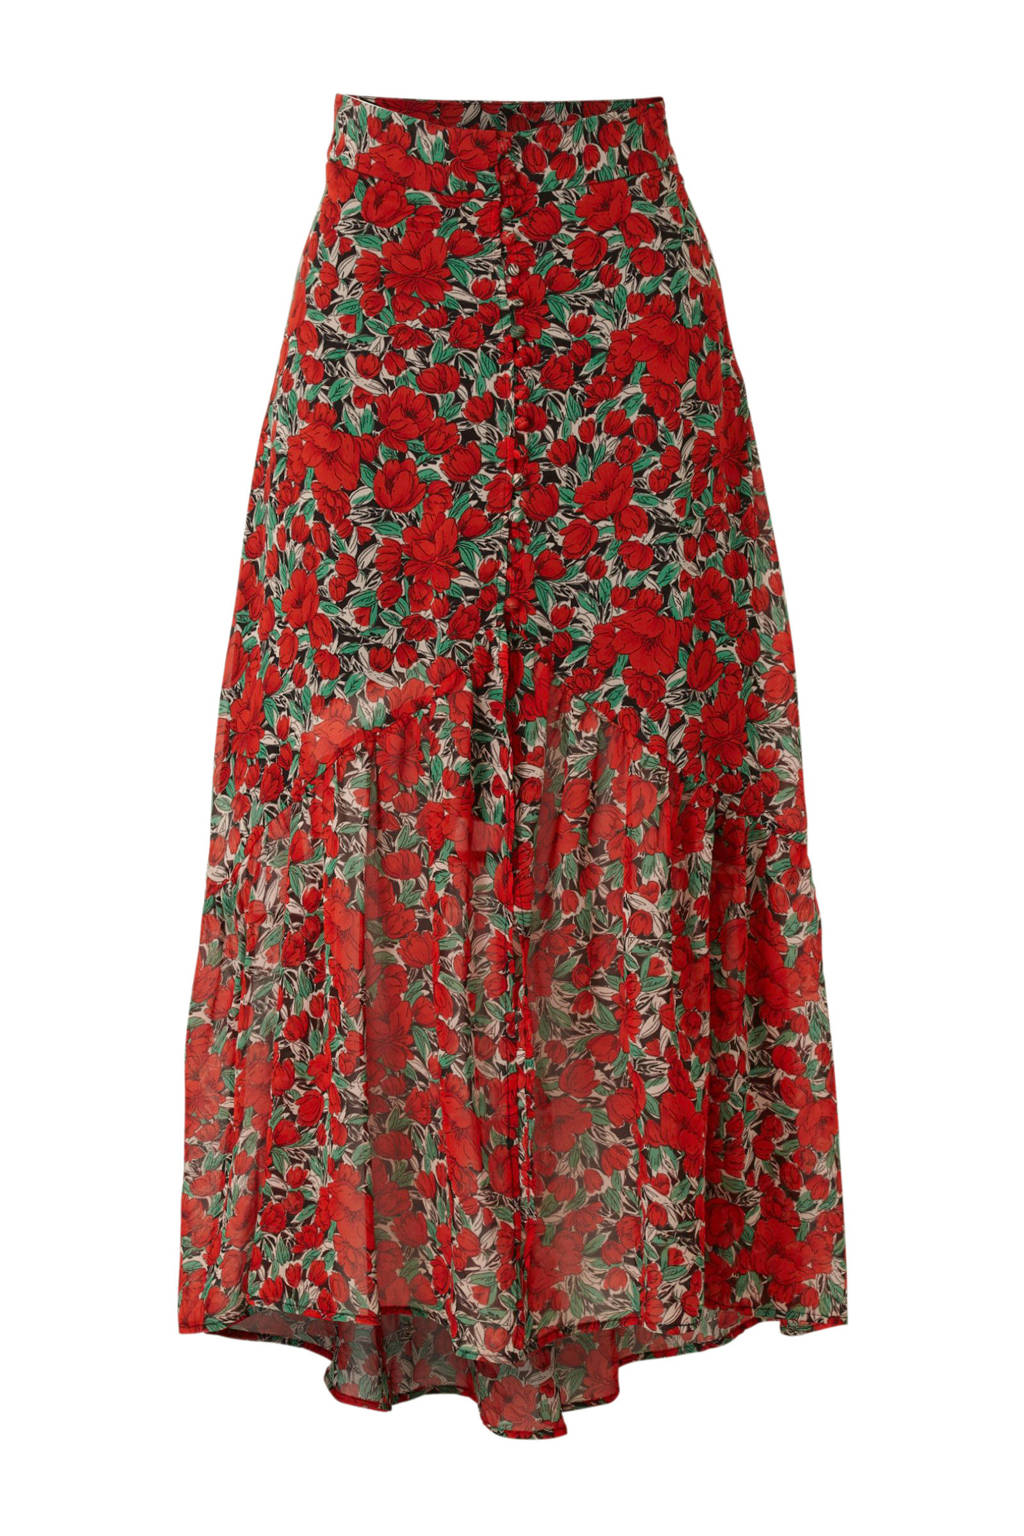 Colourful Rebel gebloemde rok rood, Rood multi